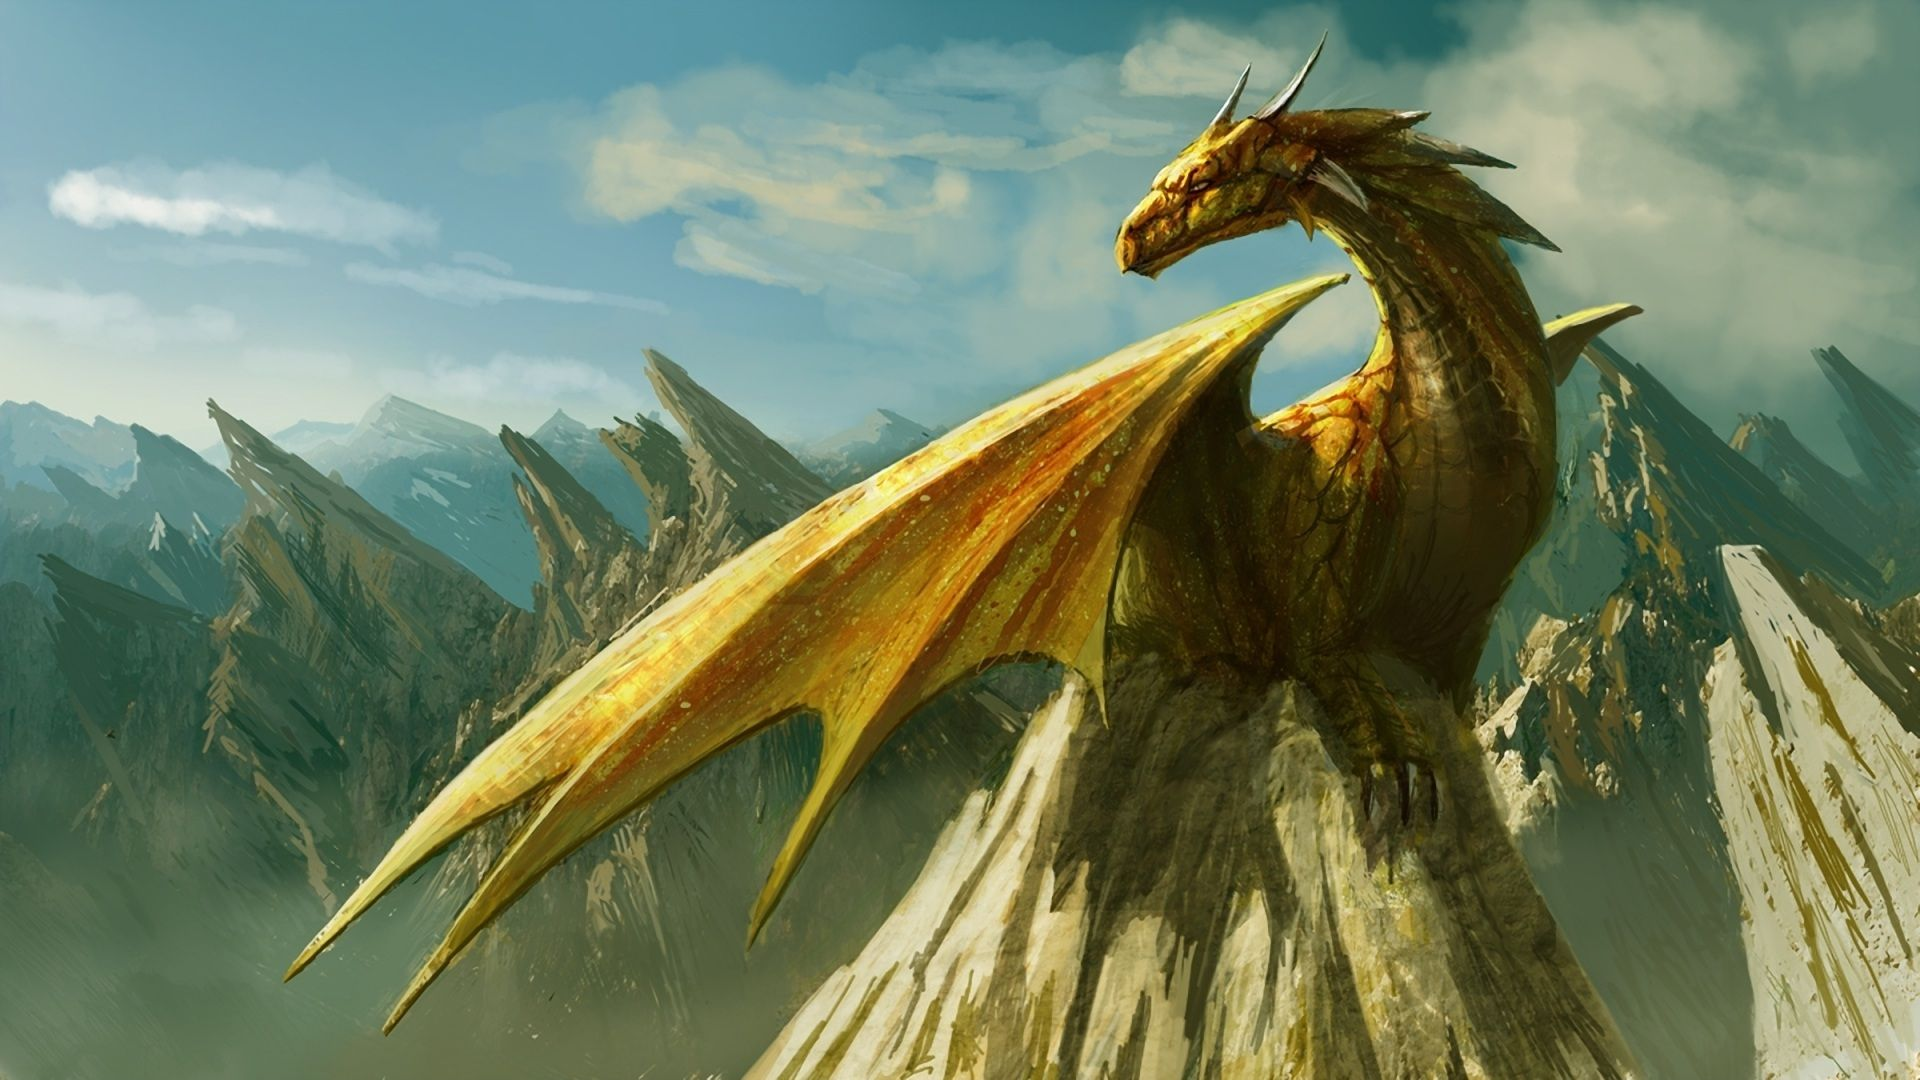 Dragon Hd Wallpaper 1920x1080 Fantasy Dragon Mythical Creatures Fantasy